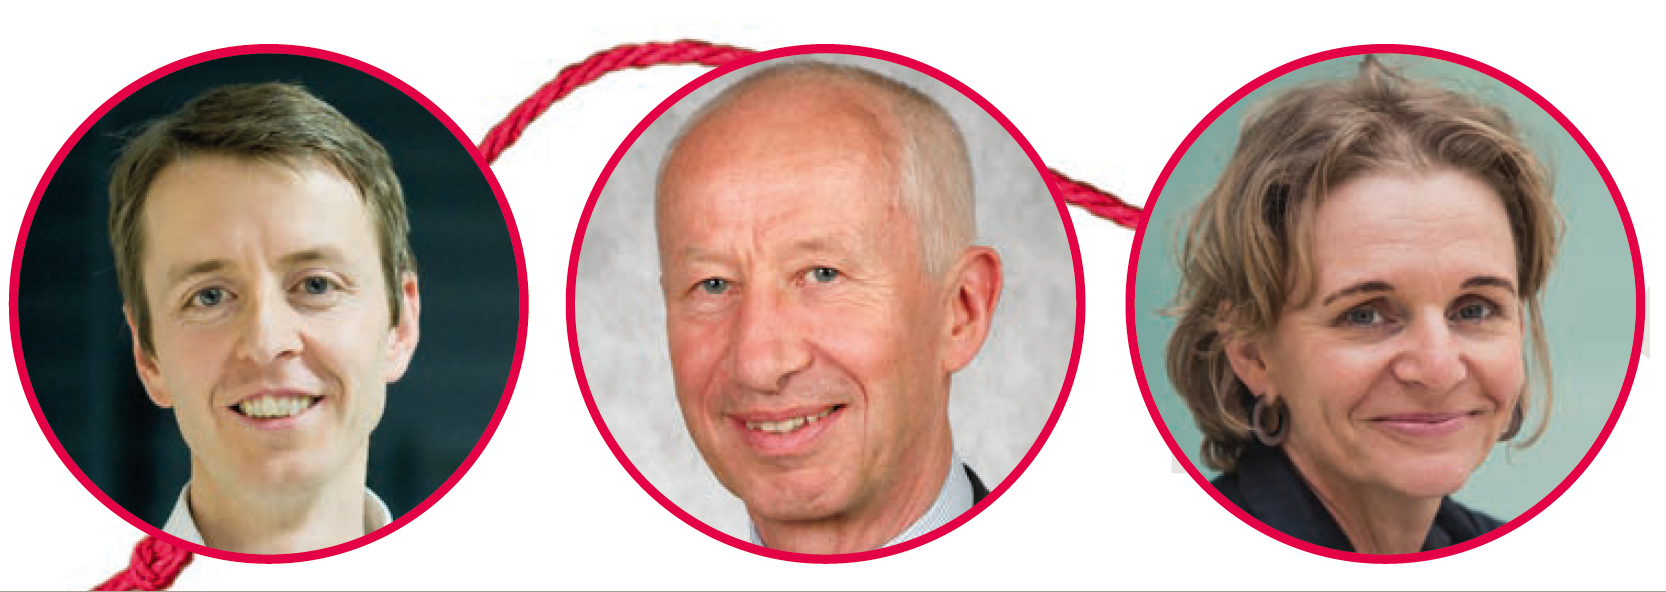 Dr. Markus STöcher Dr. Wolfgang Schachinger Martina Nimmervoll